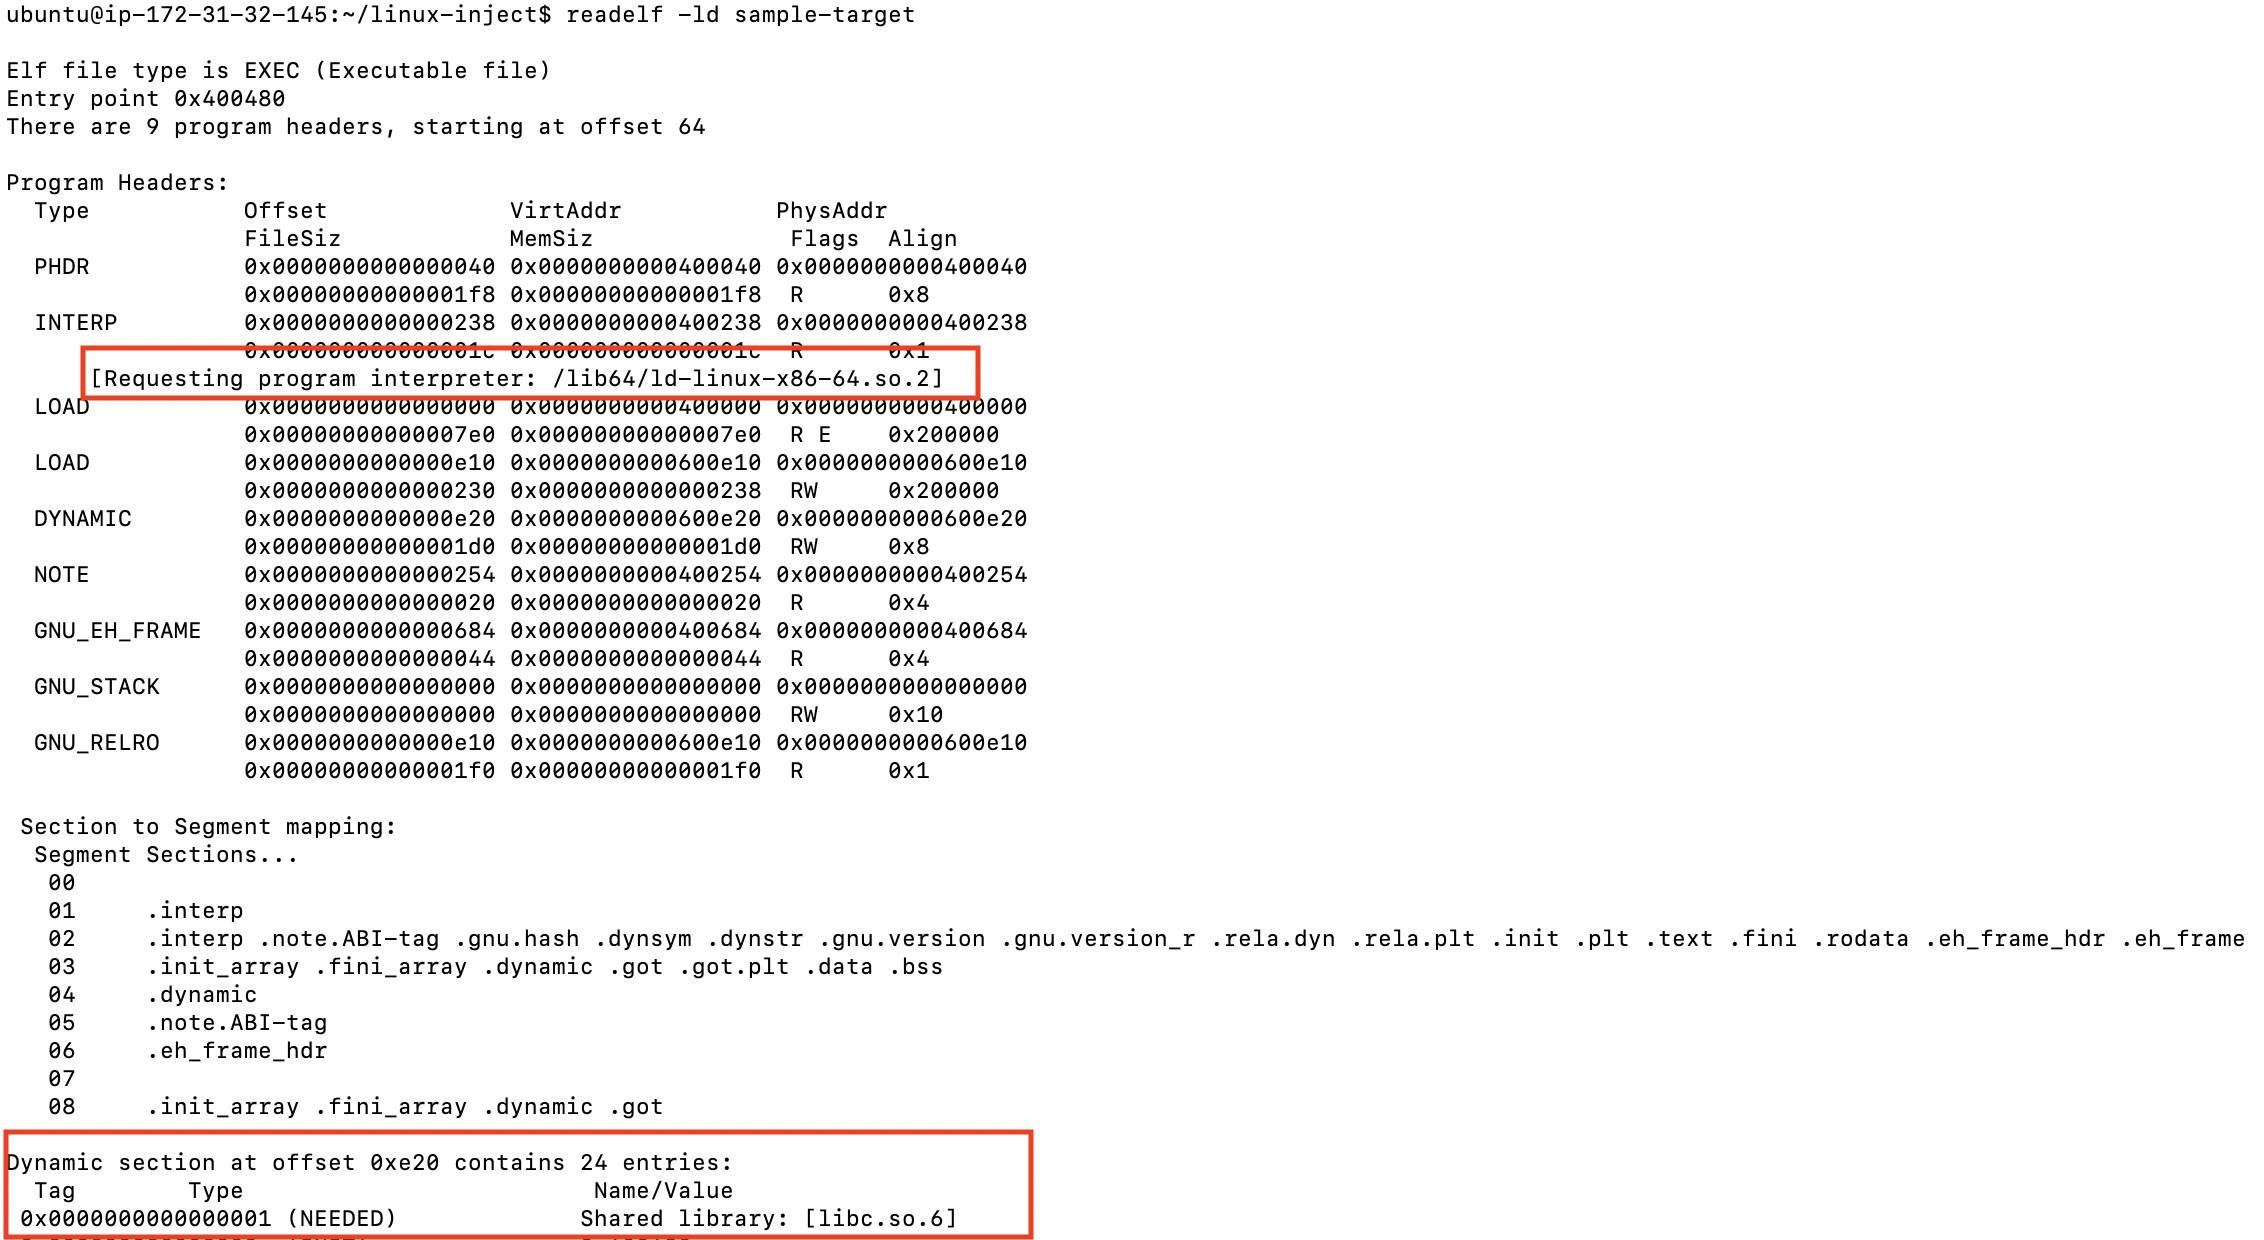 sample-target ELF file